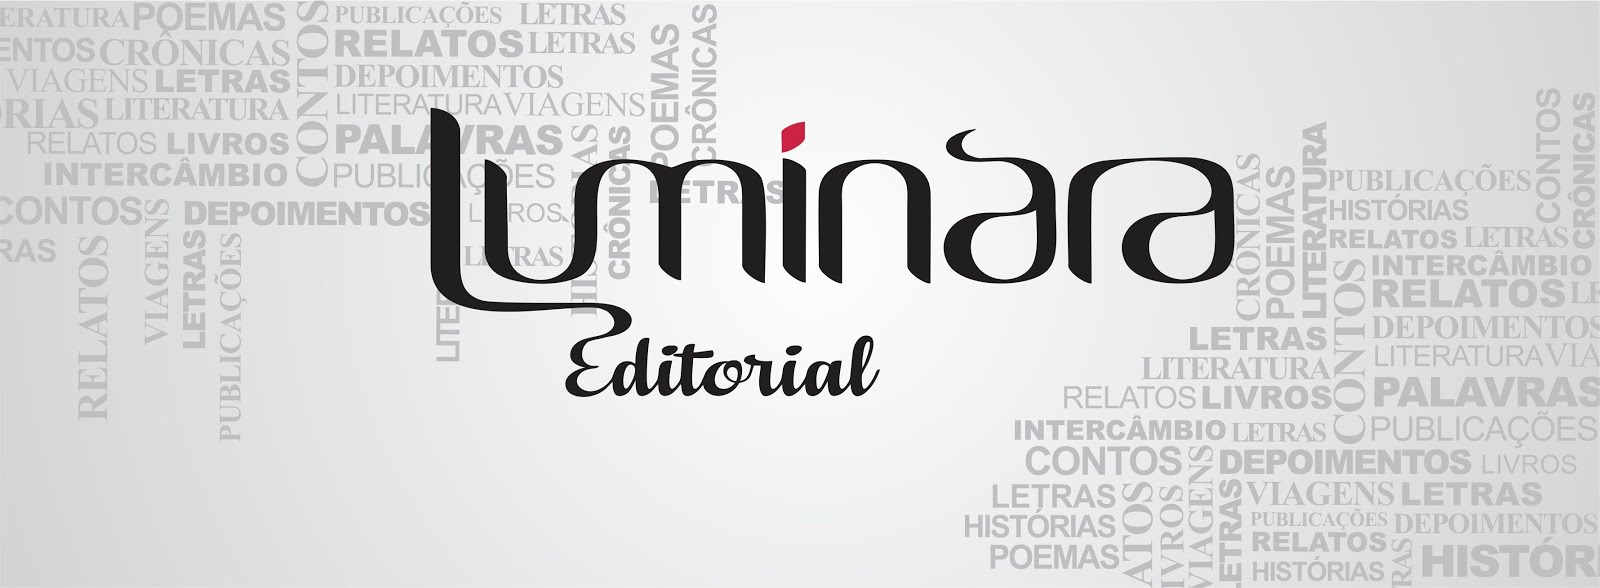 Luminara Editorial